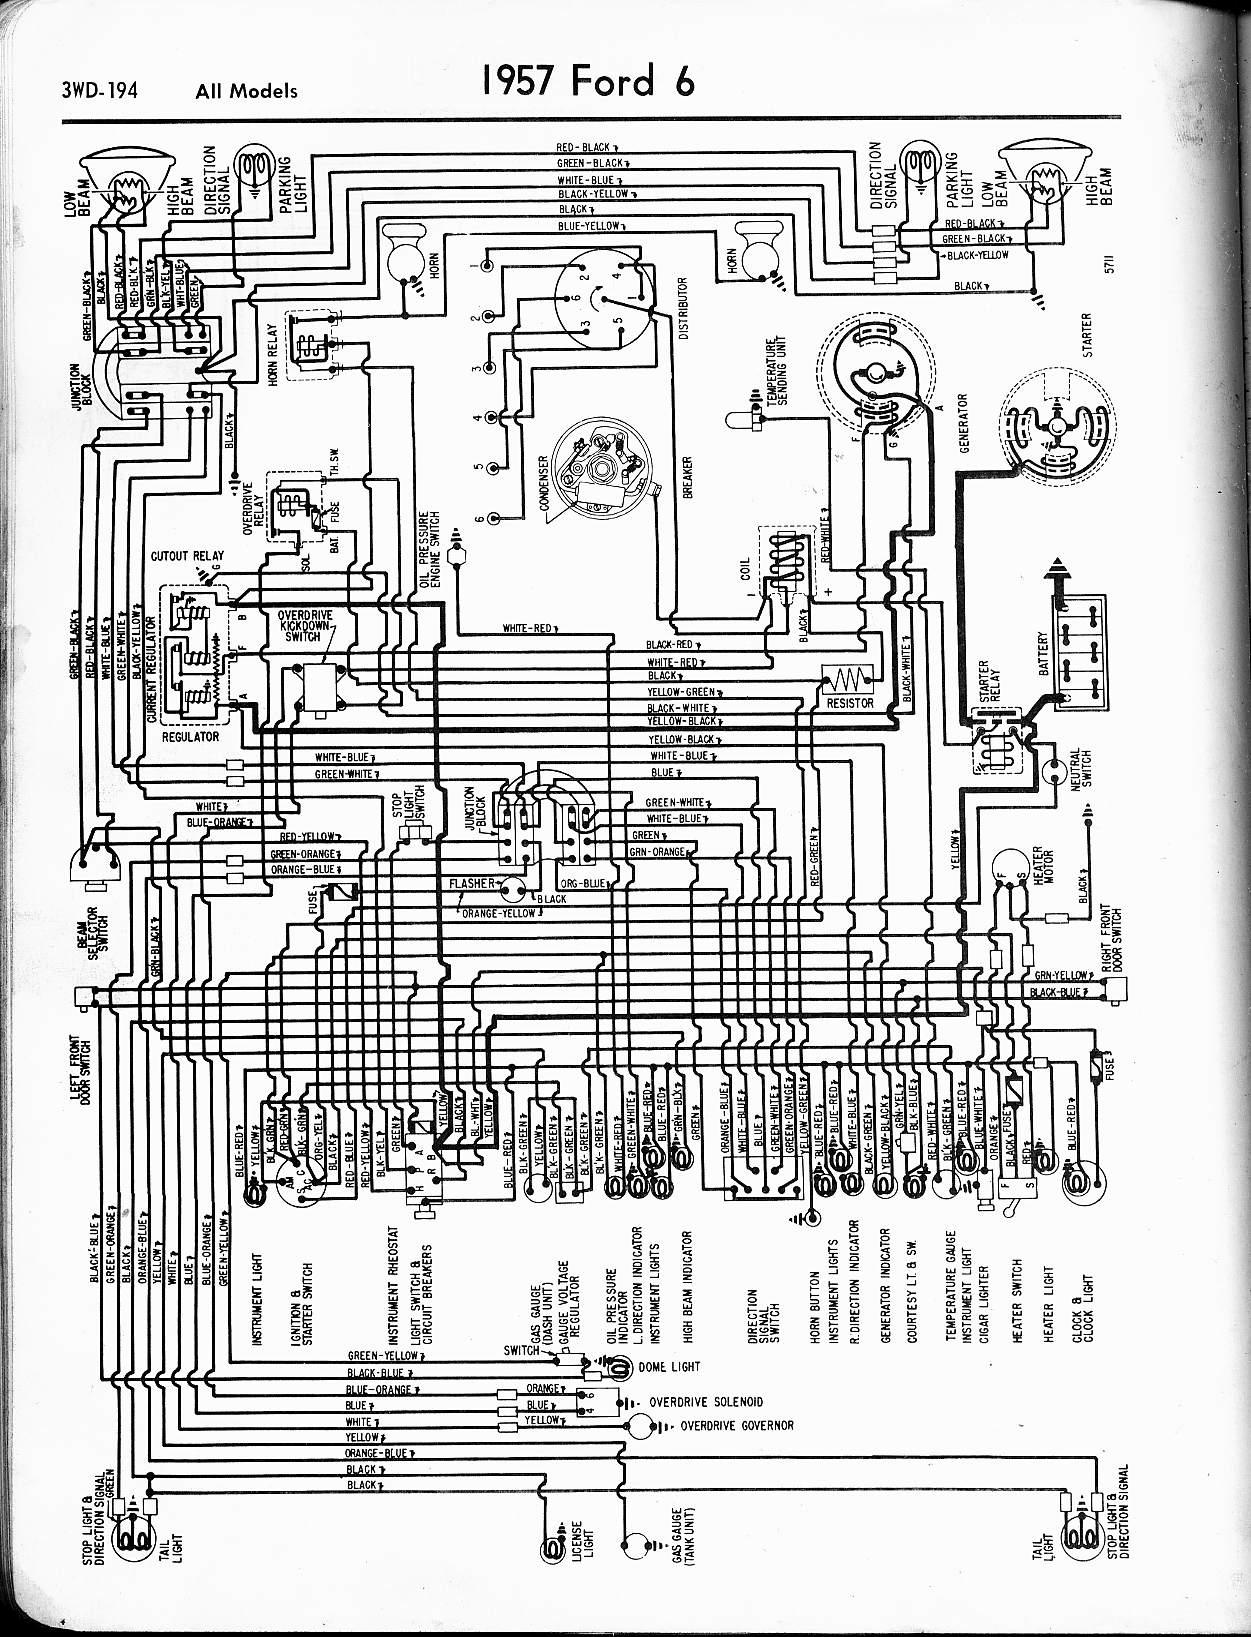 painless wiring 1955 ford fairlane